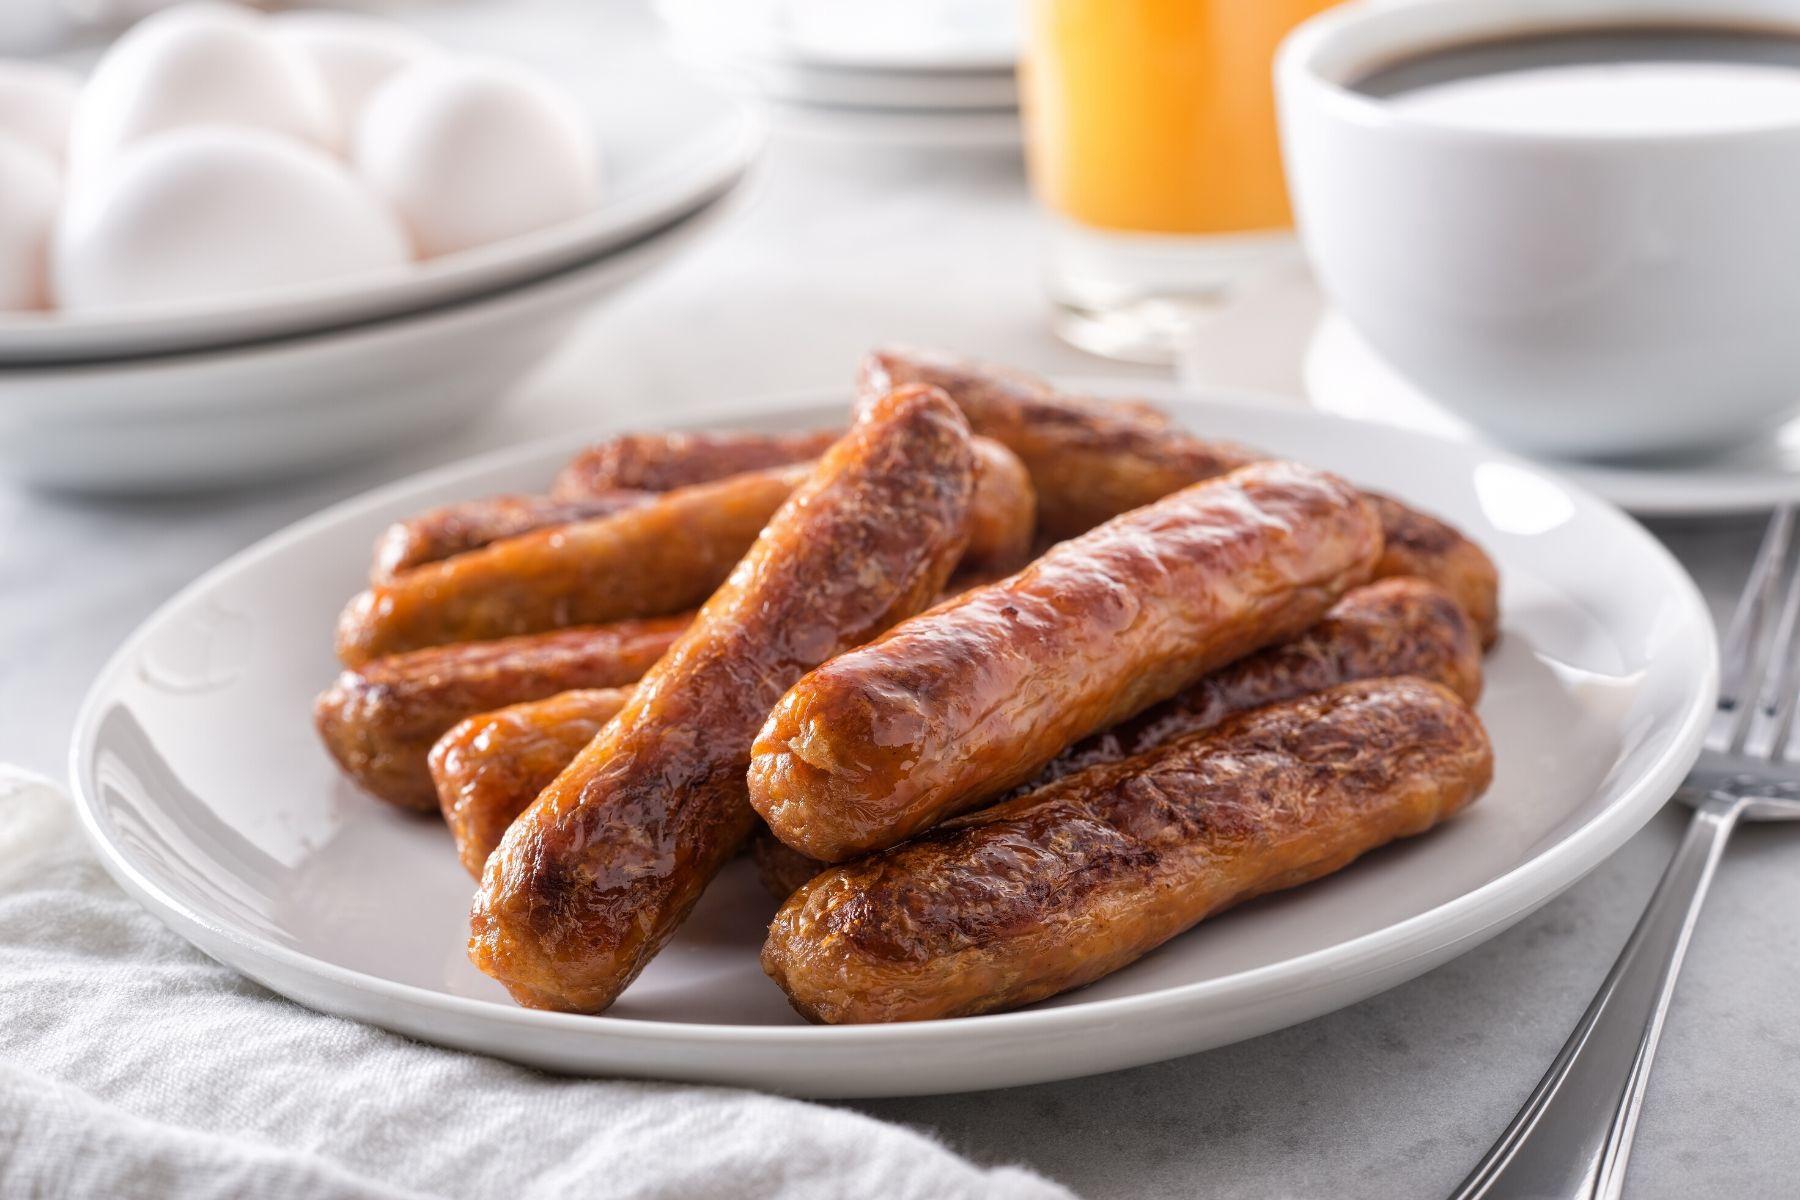 Maple Bacon Breakfast Sausage